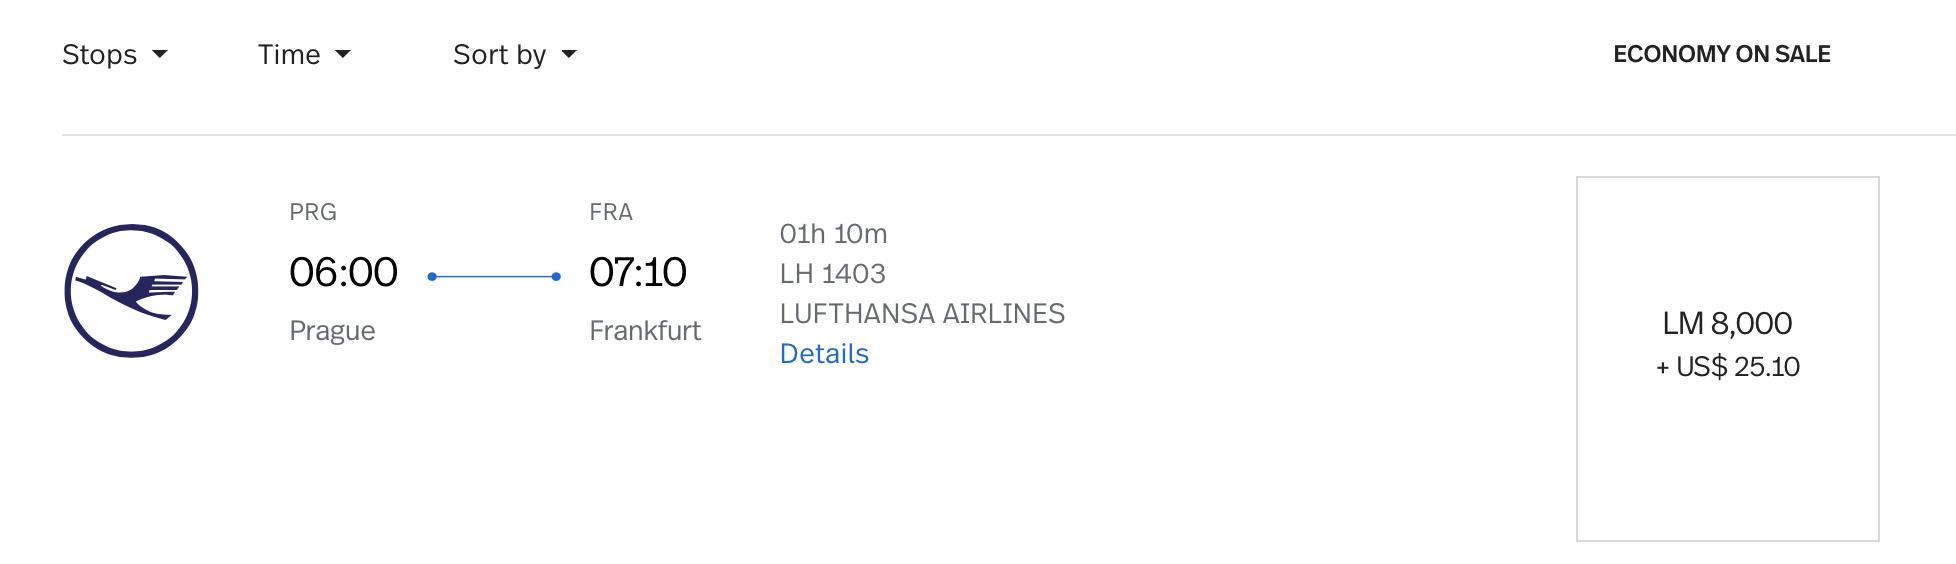 PRG to FRA LifeMiles Pricing on Lufthansa